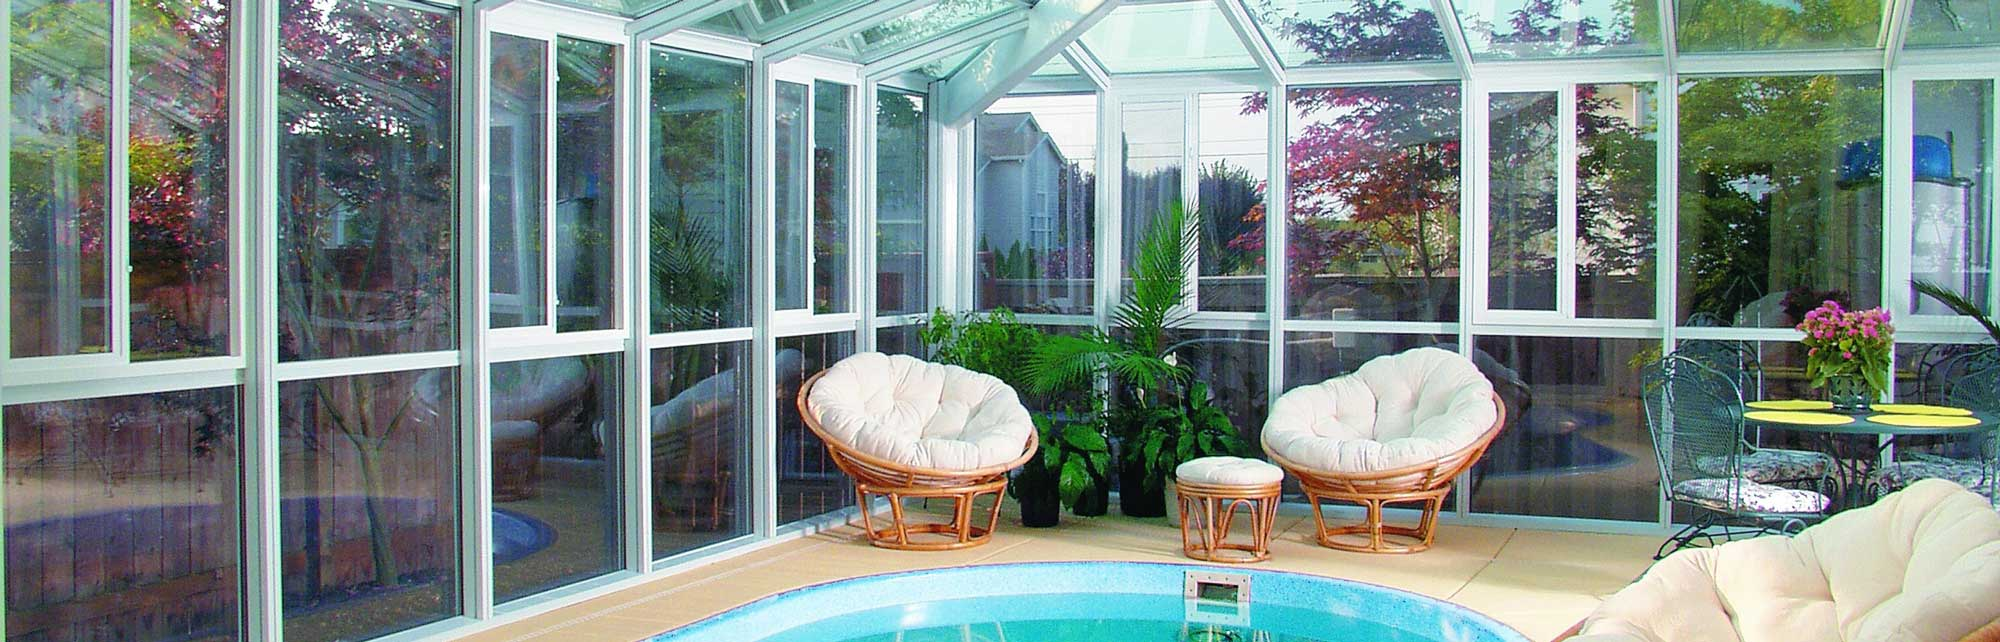 pool enclosure with surrounding pool furniture